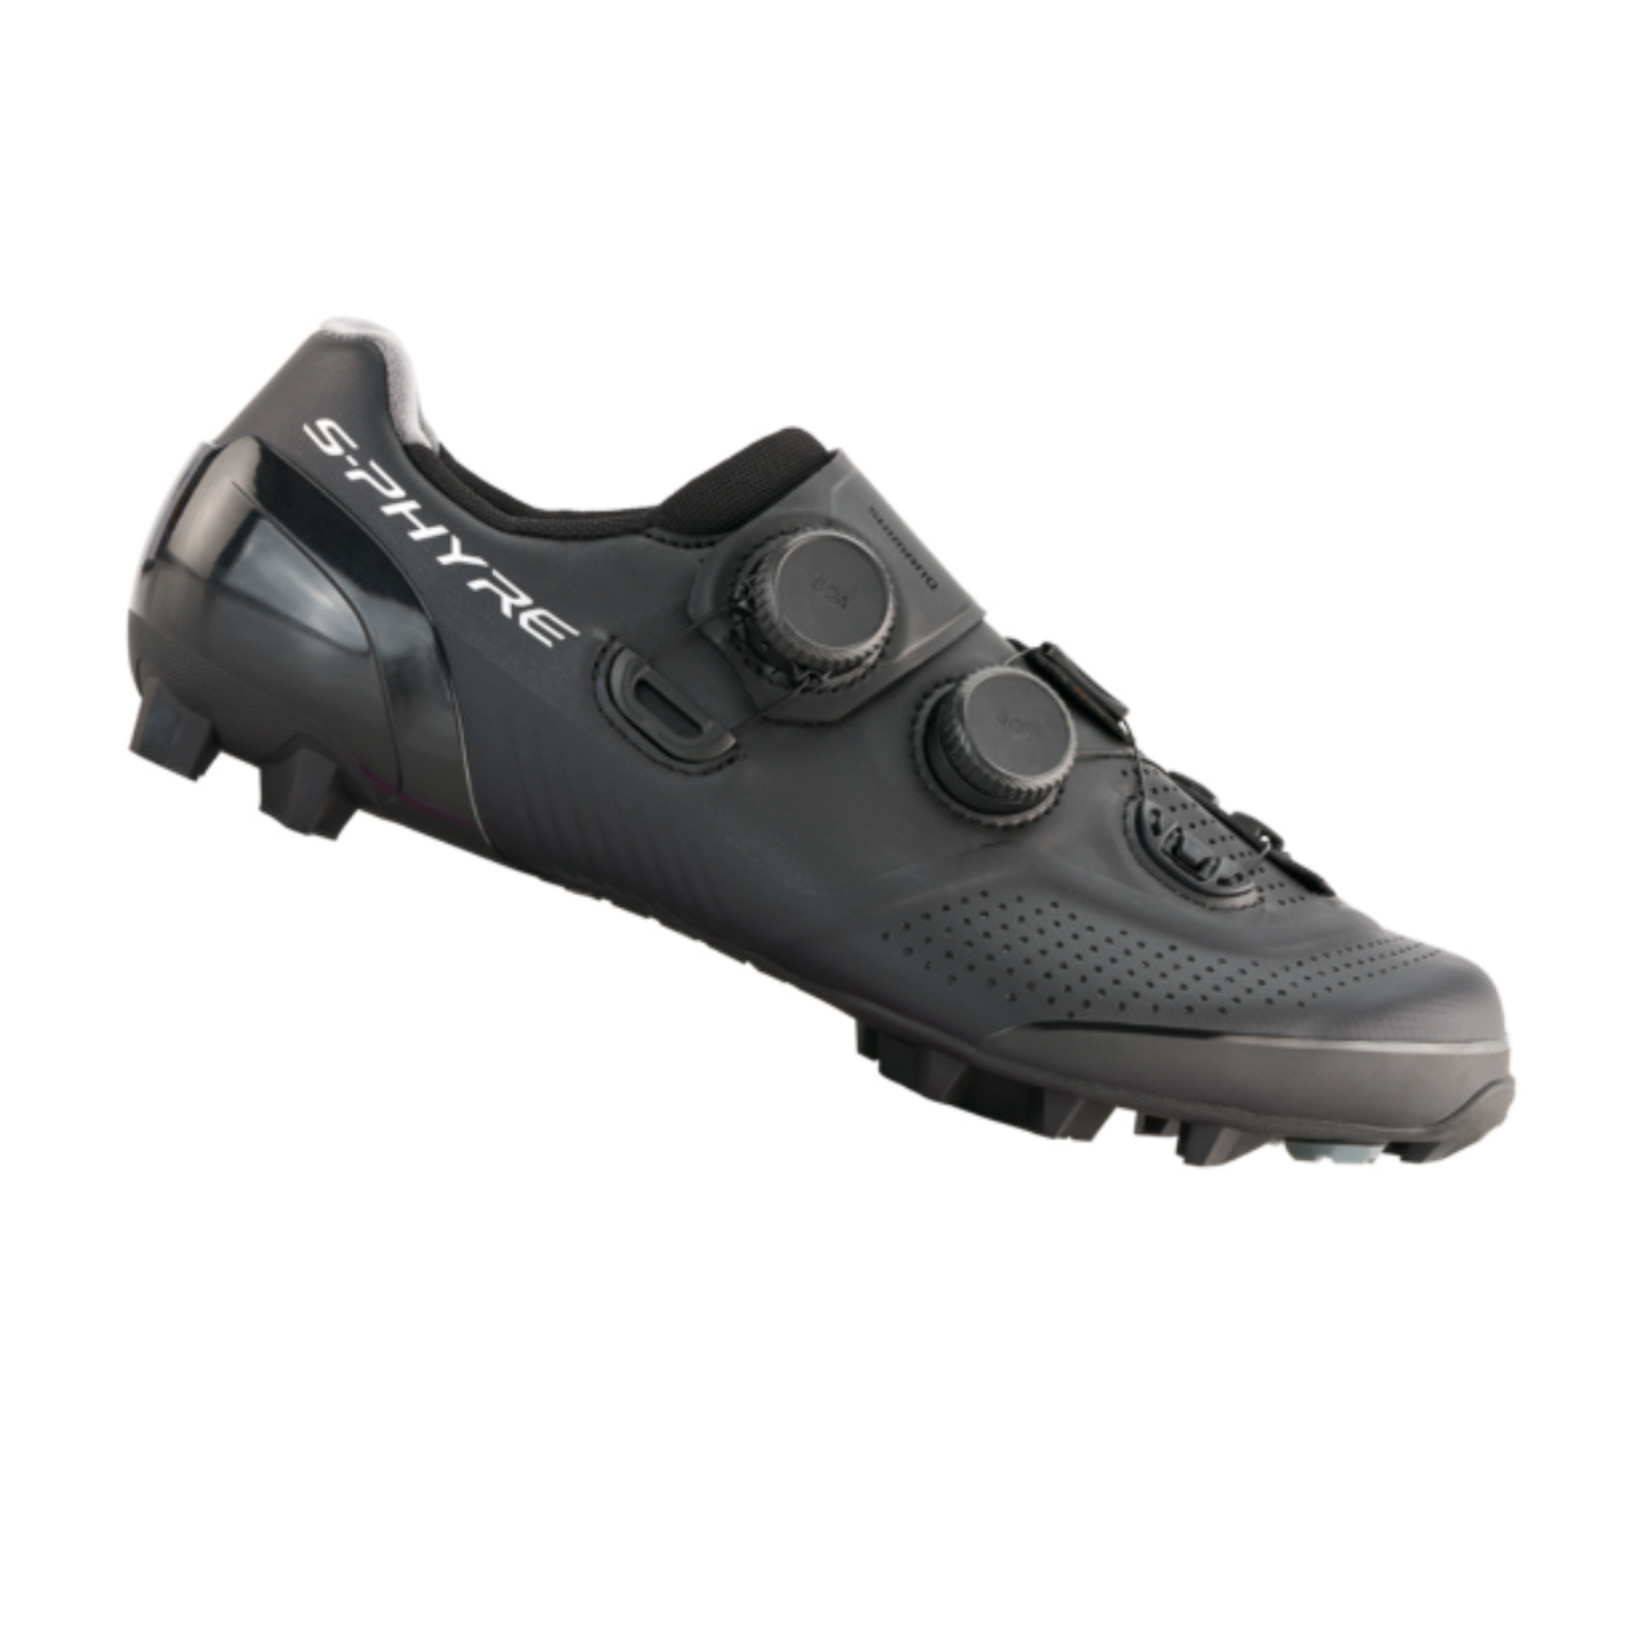 SHIMANO Shimano SH-XC901 S-PHYRE Shoes